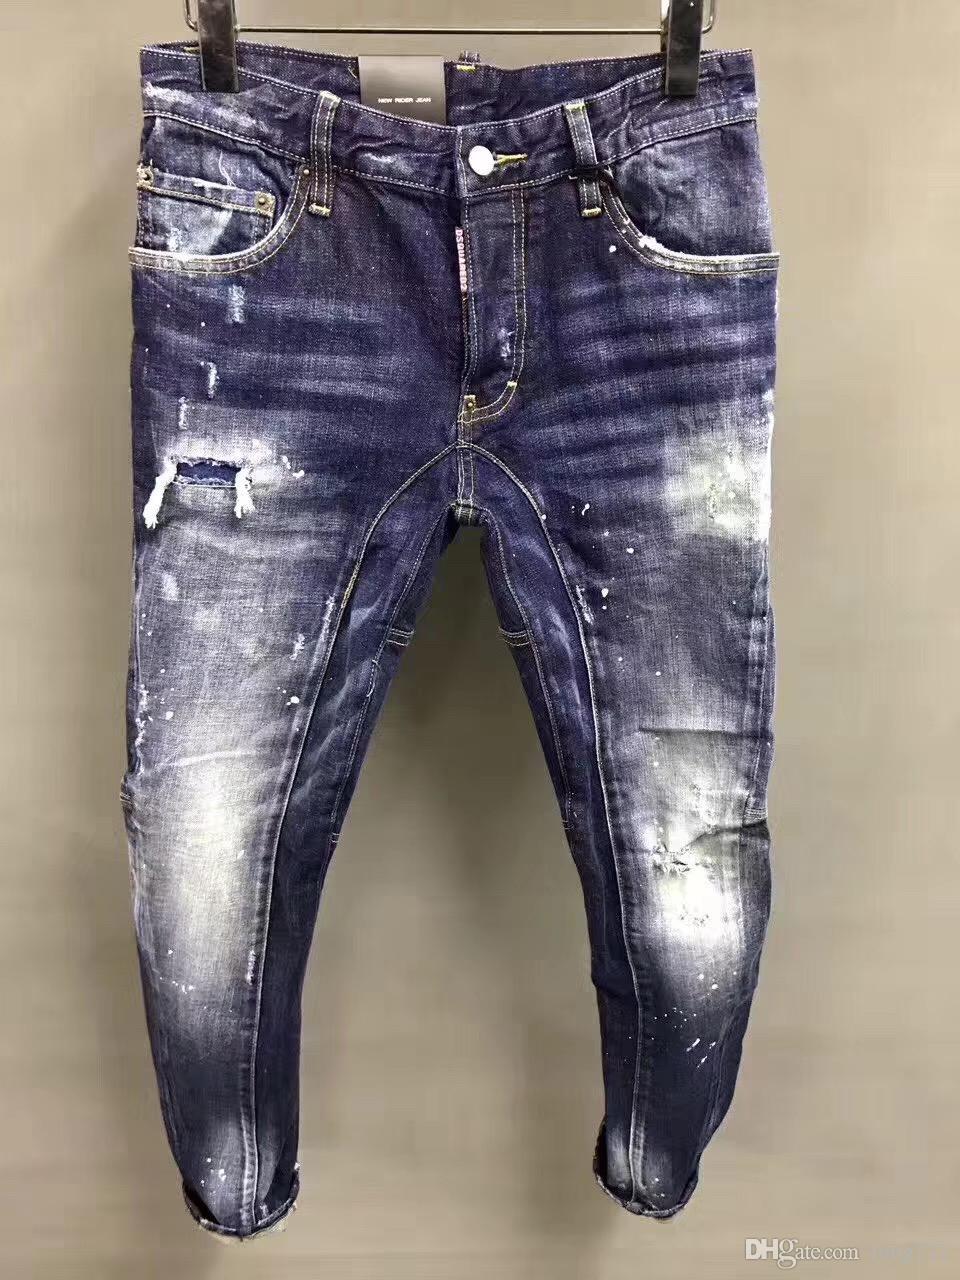 0854c1d8cf9ed7 Acquista 2019 Moda Uomo Denim Biker Jean Ricamo Pantaloni Holes Casual  Jeans Button Pants D2 Pantaloni Lunghi 1622 A $40.61 Dal Long721 |  DHgate.Com